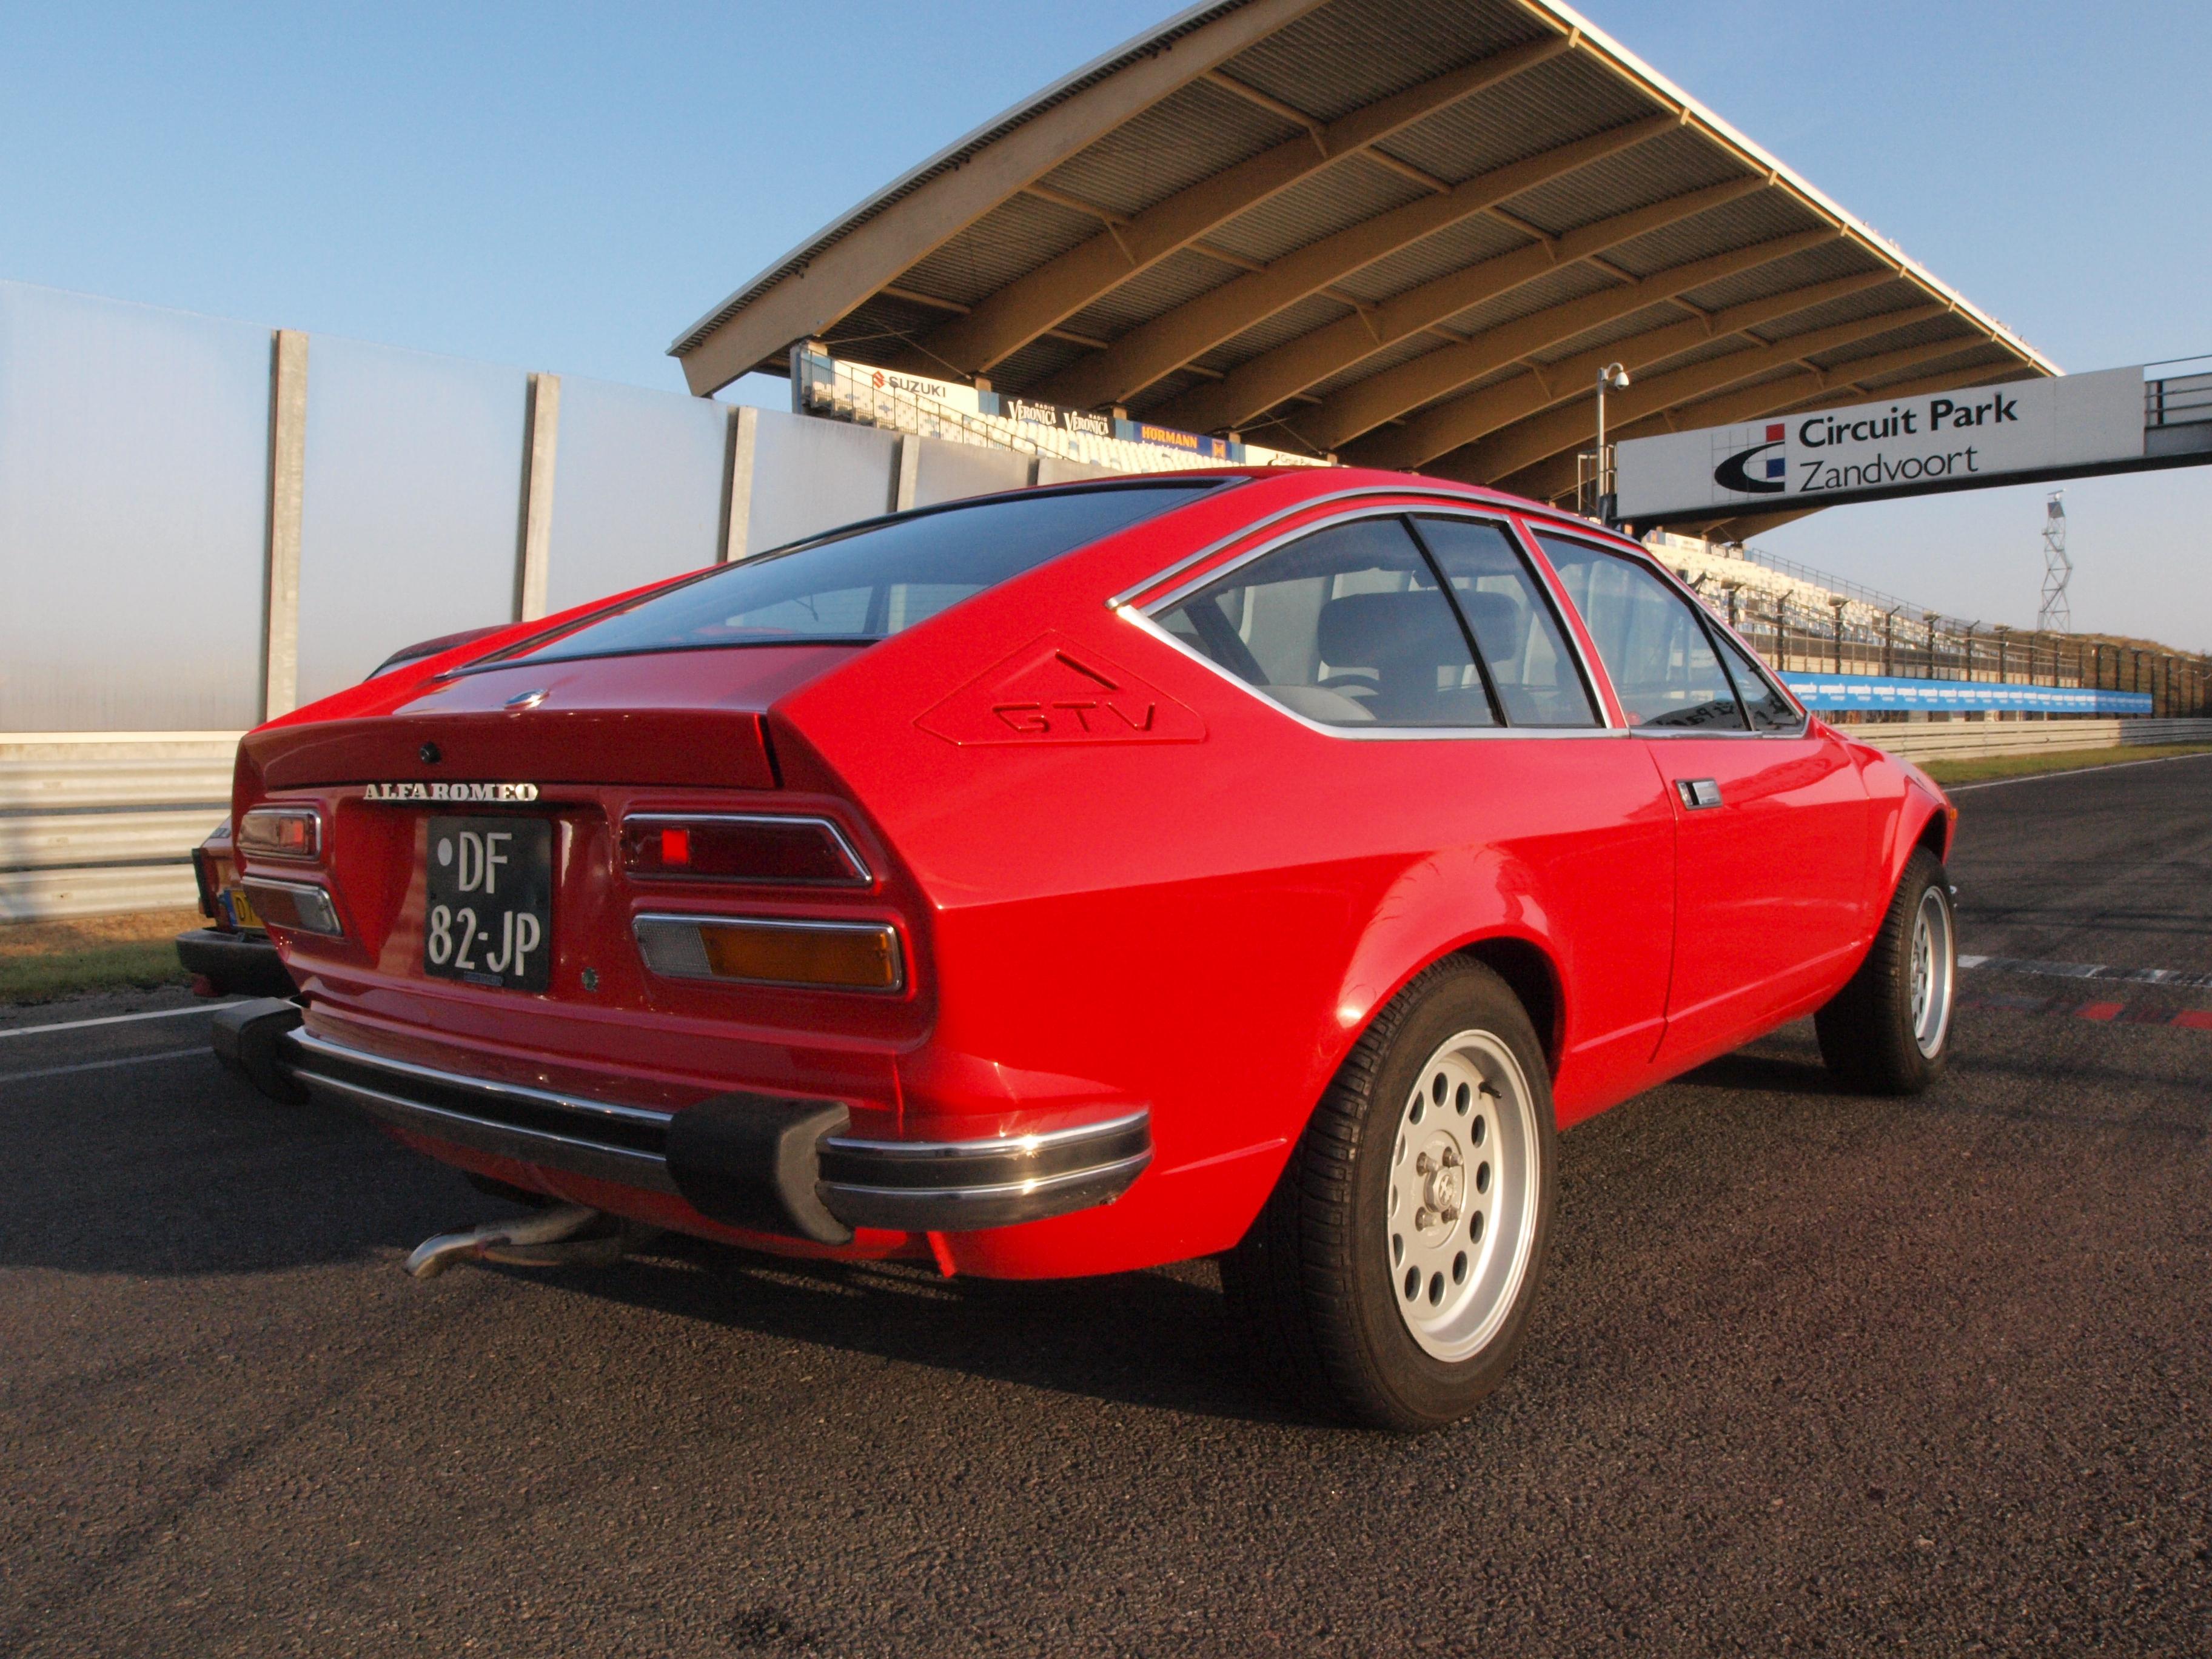 File:Alfa Romeo Alfetta 2000 GTV dutch licence registration DF-82-JP pic2.JPG - Wikimedia Commons